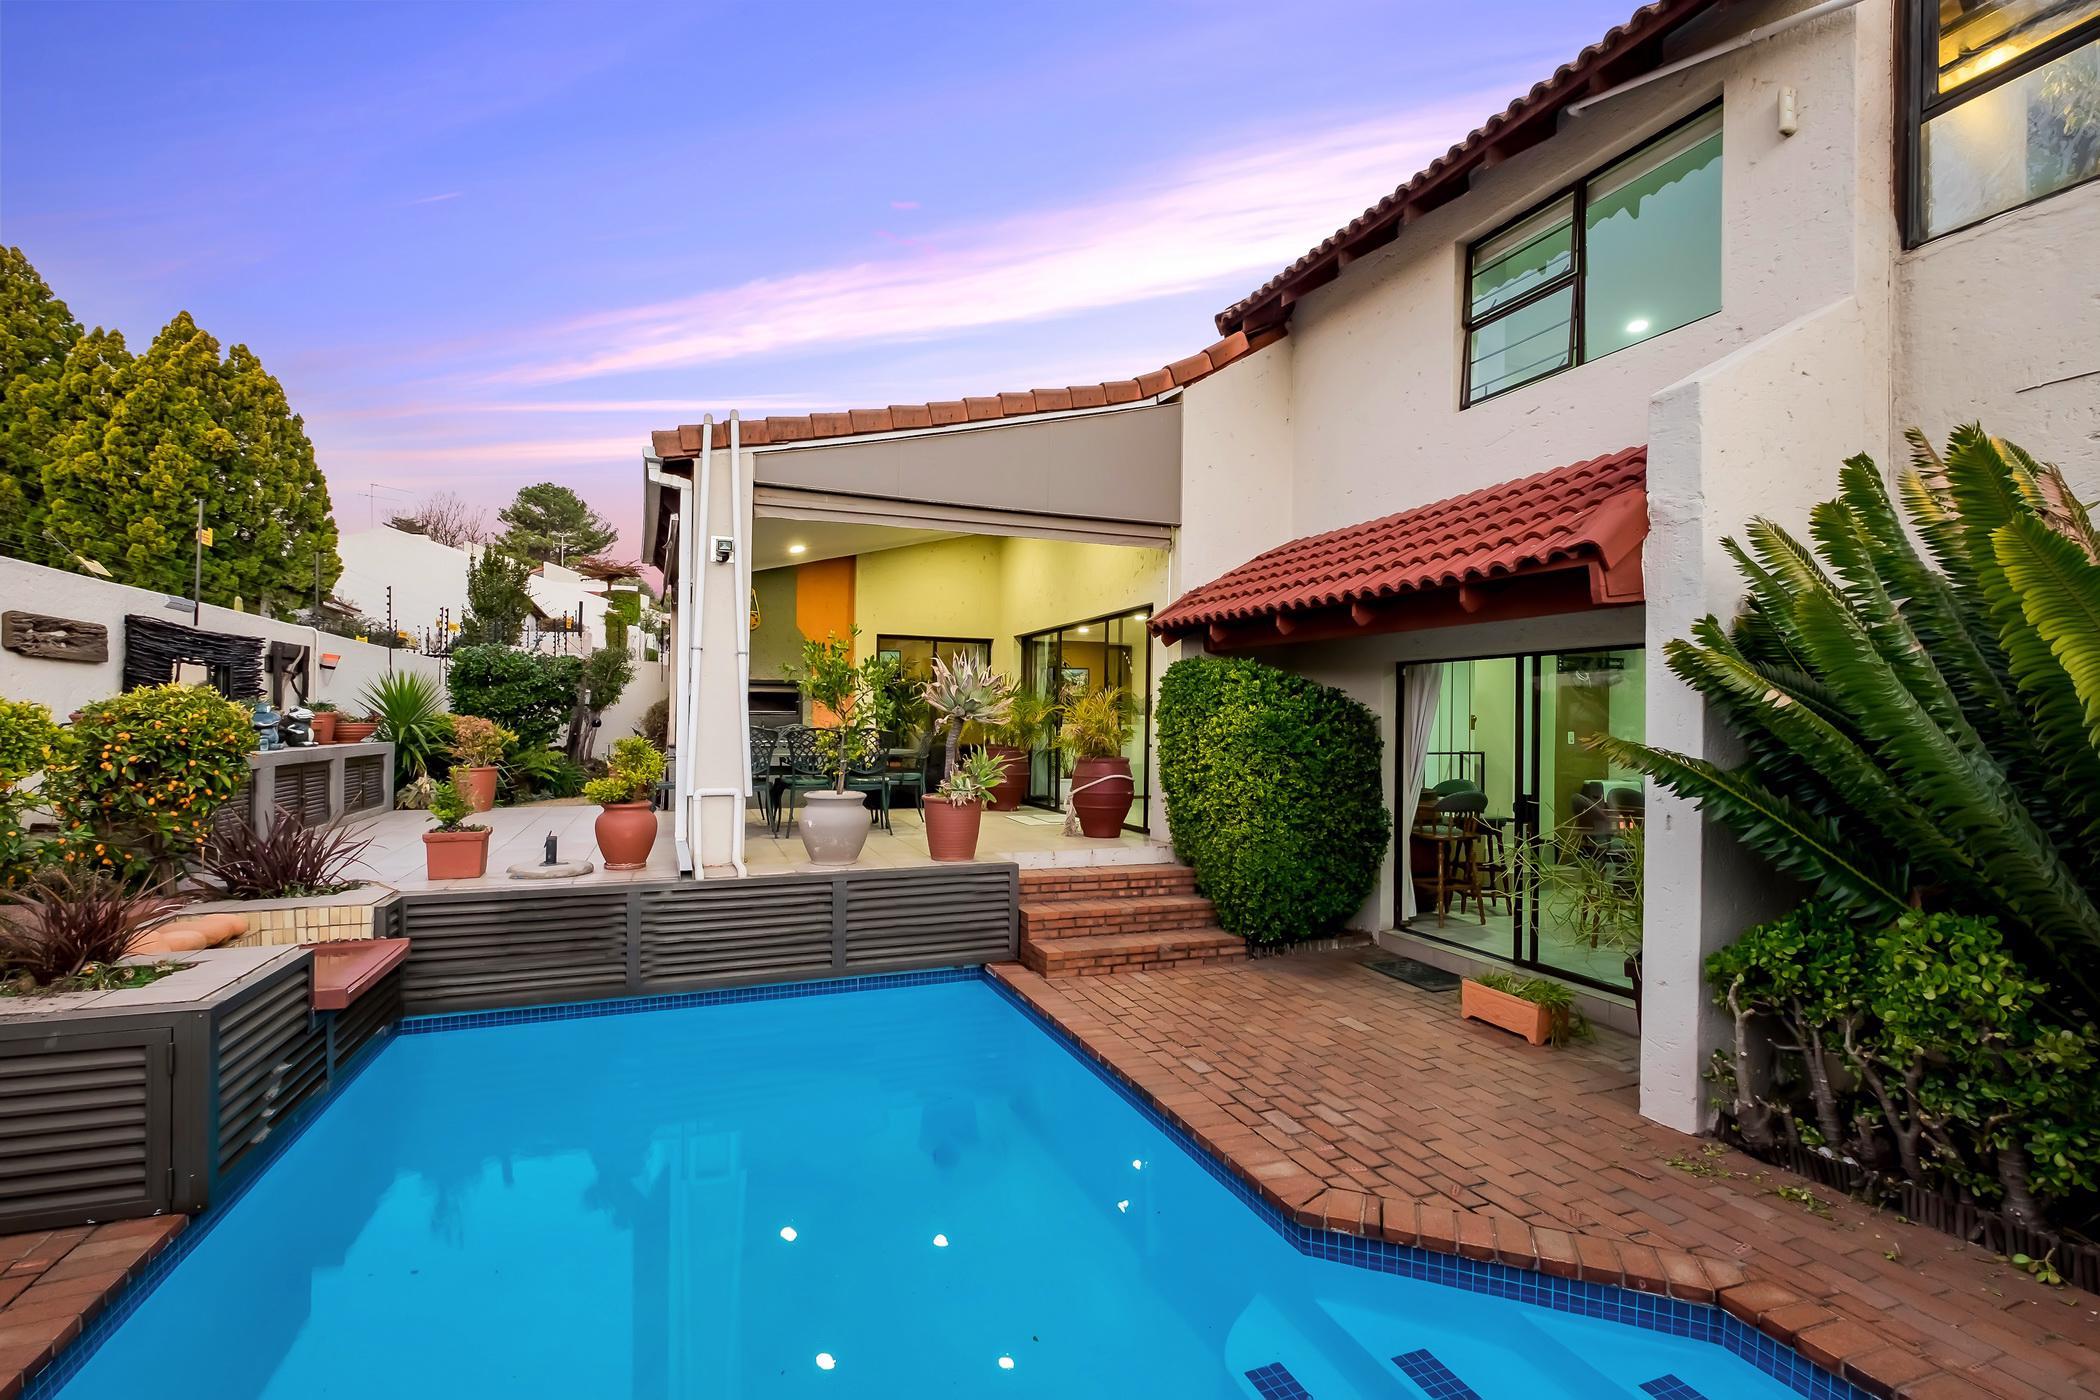 3 bedroom house for sale in Edenburg (Rivonia)